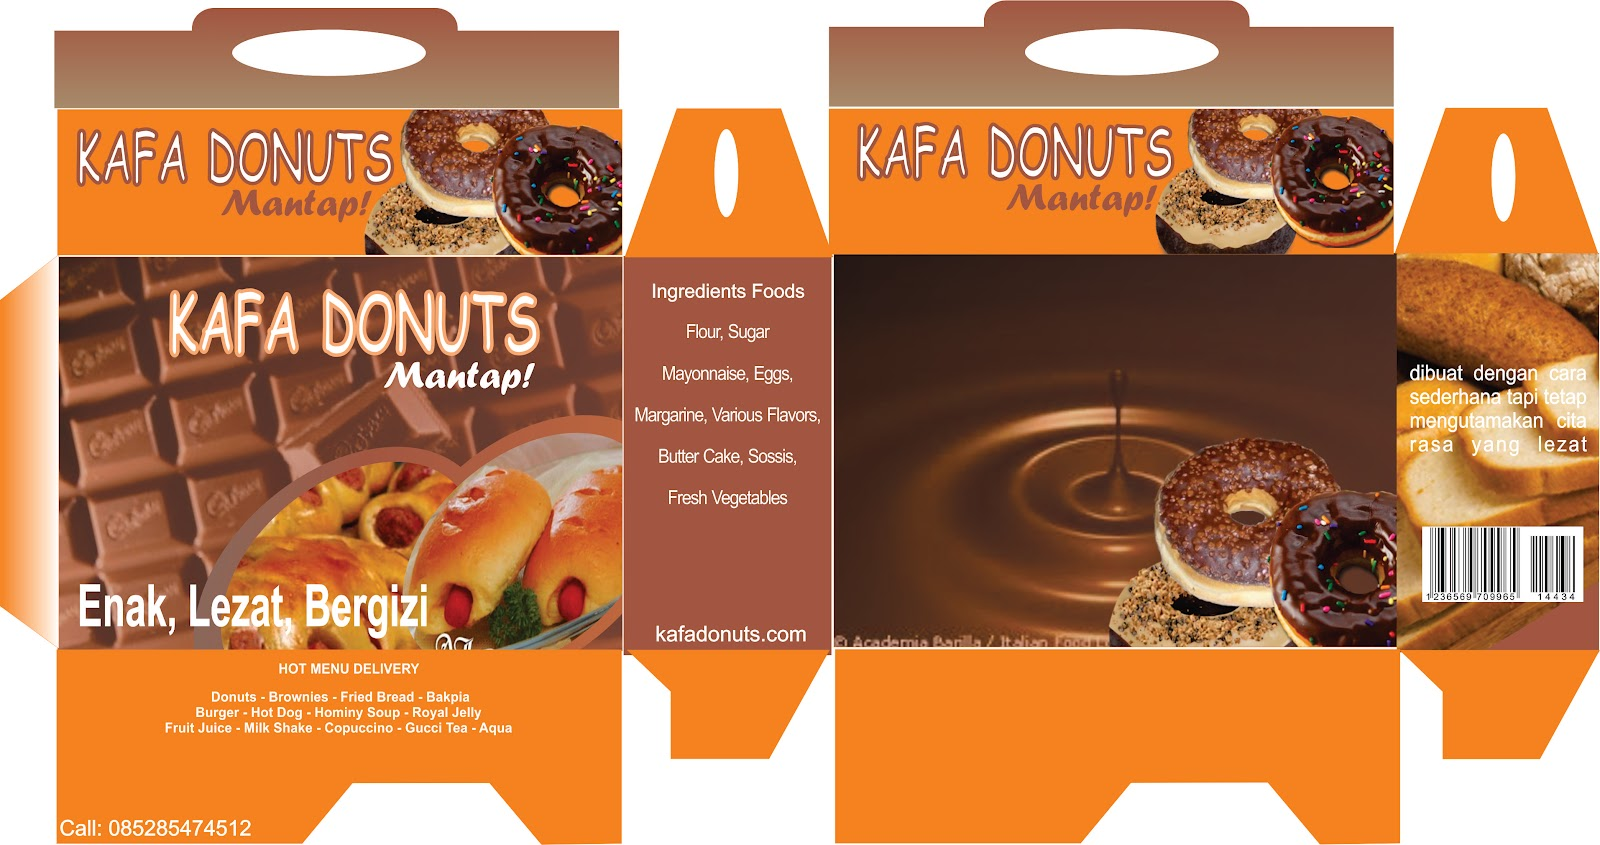 KAFA DONUTS: GALLERY